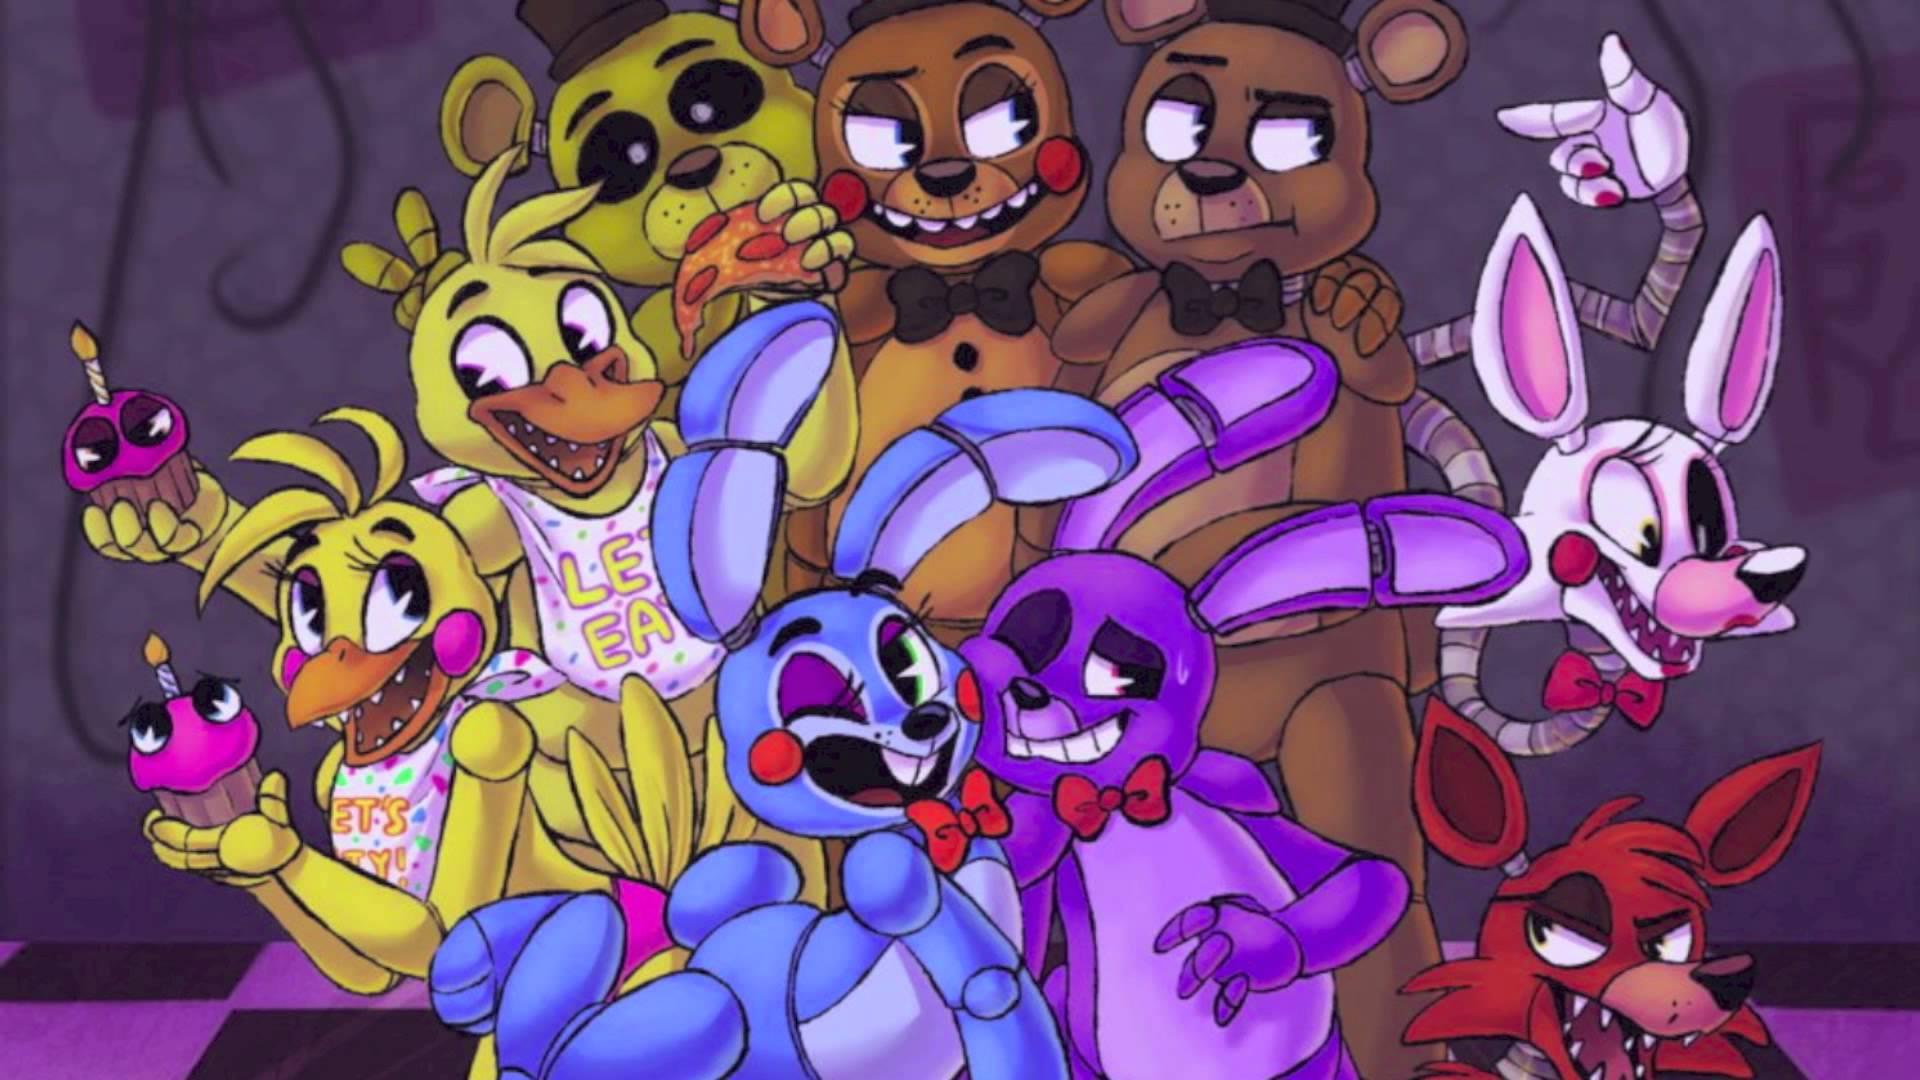 Five Nights At Freddys 2Sayonara MaxwellFNAF 1920x1080